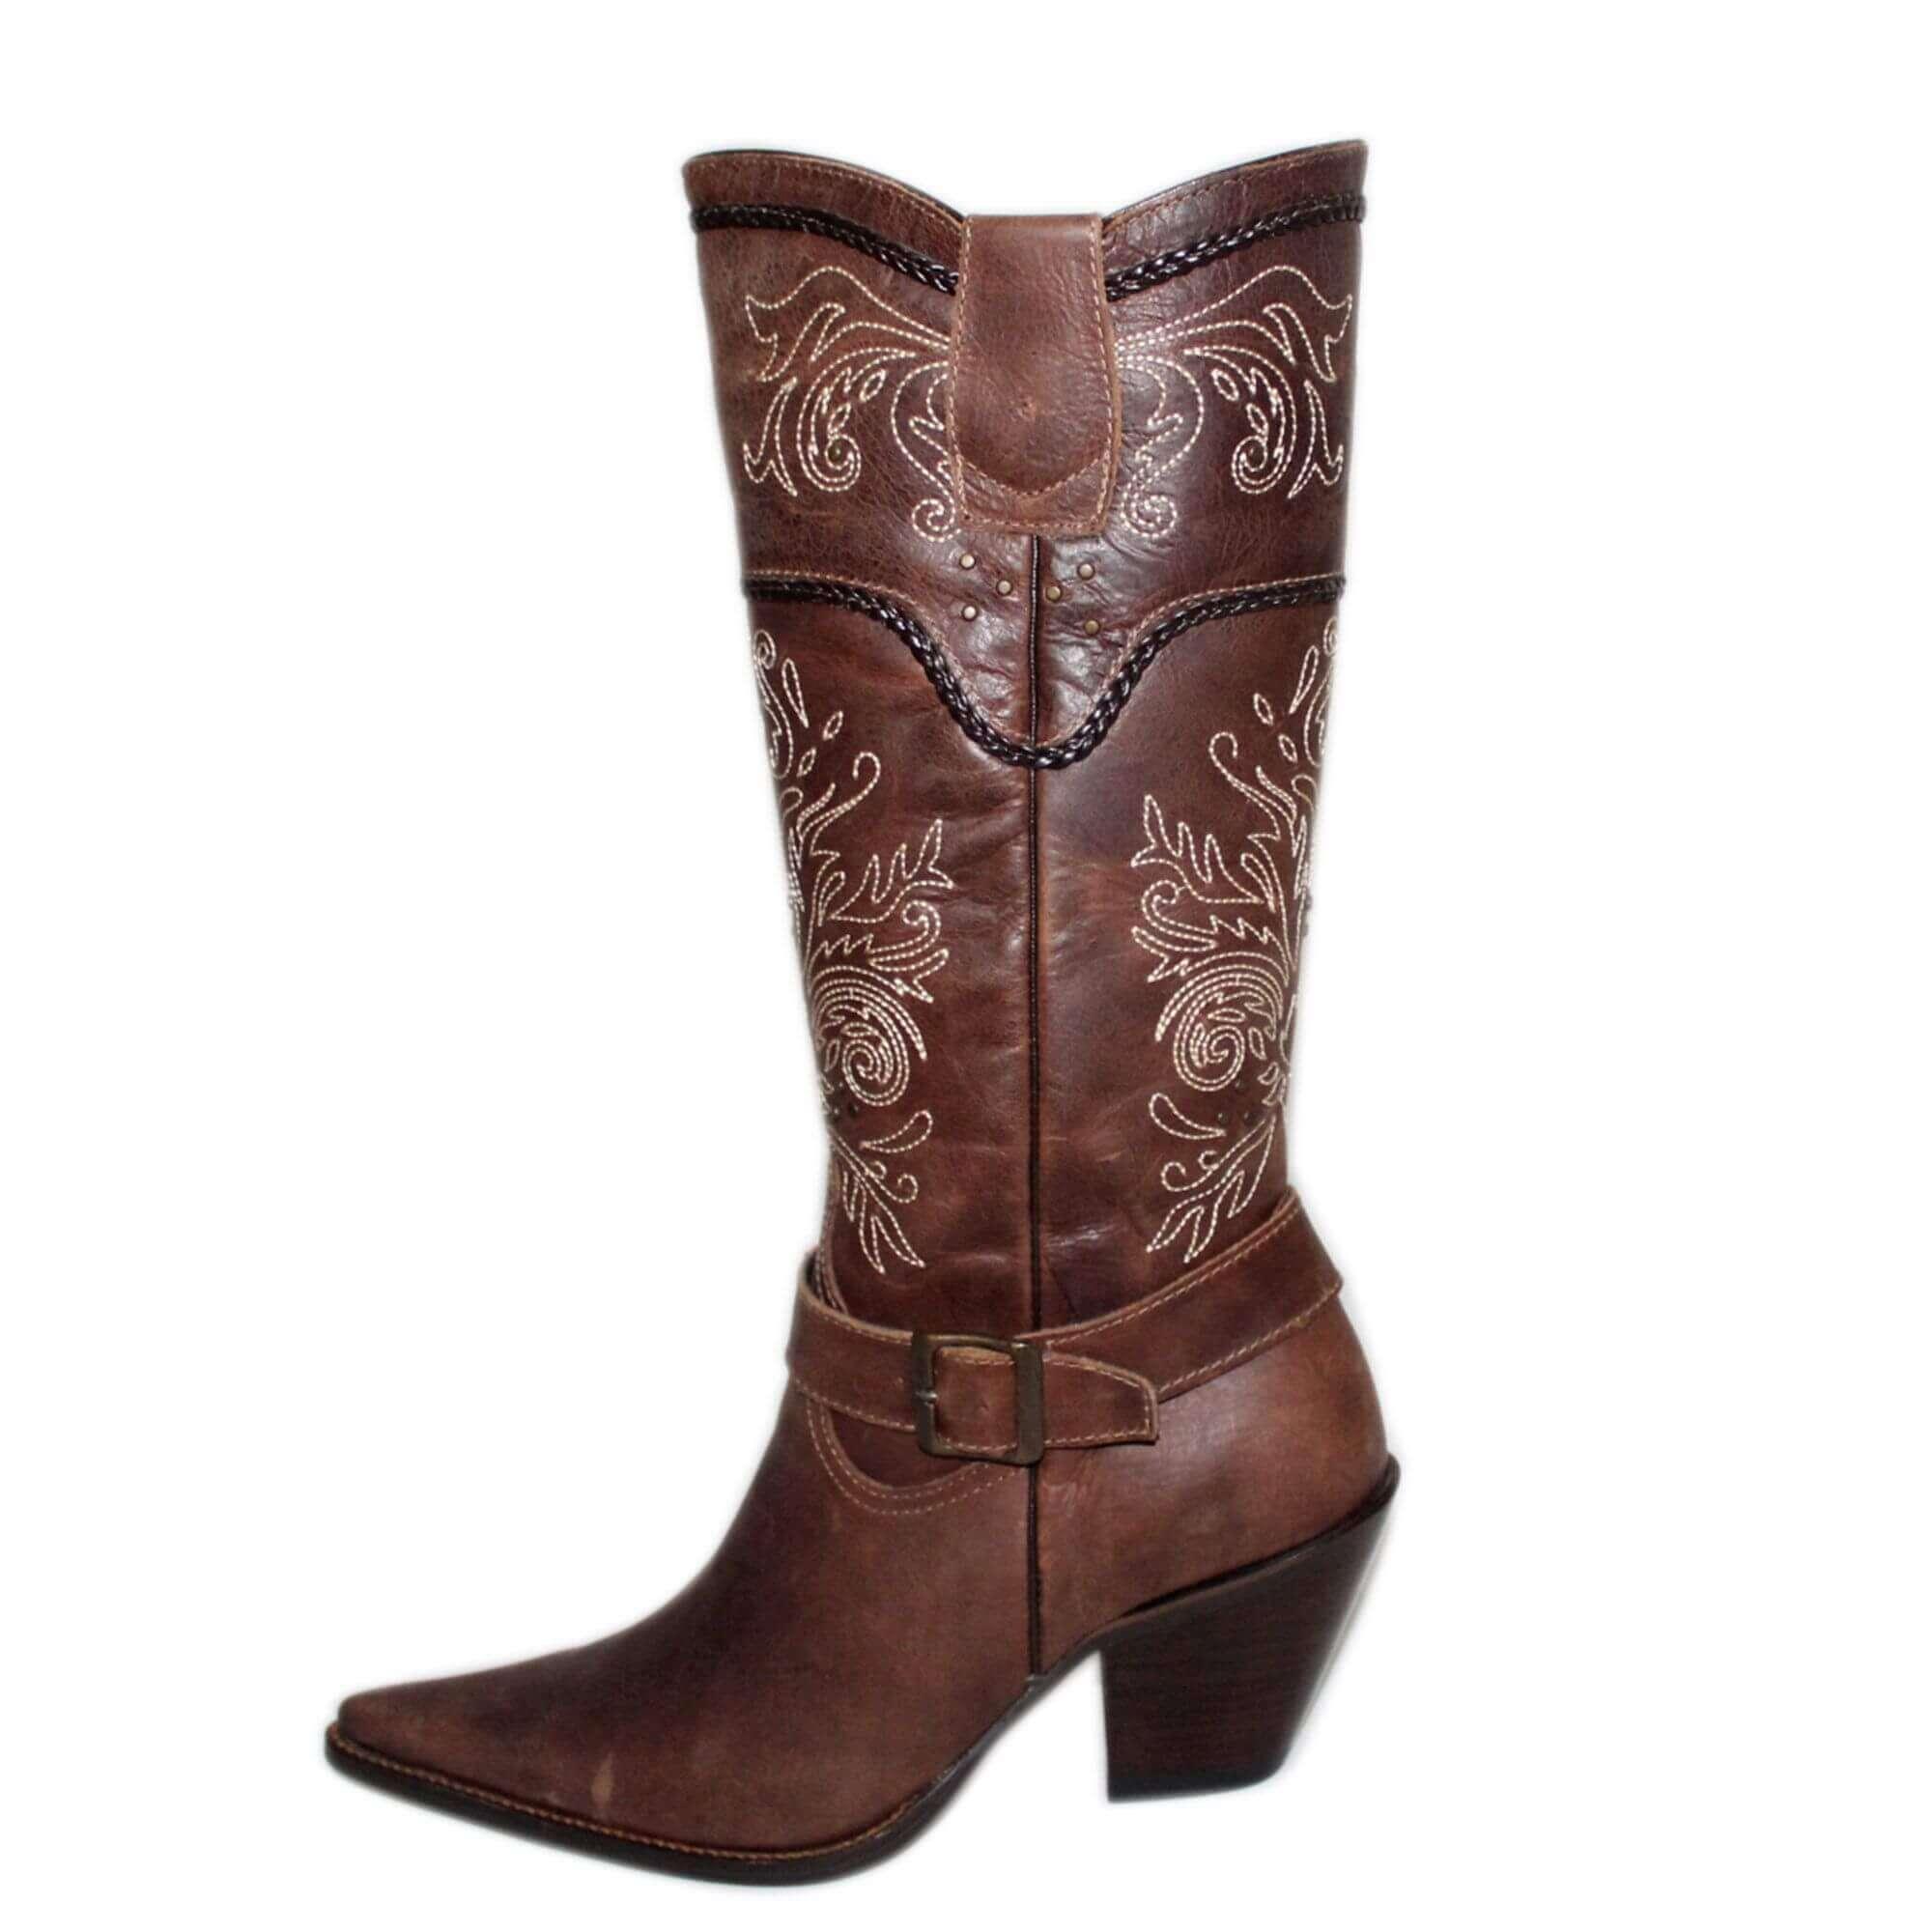 Bota Vimar Boots Feminina Couro Castanho